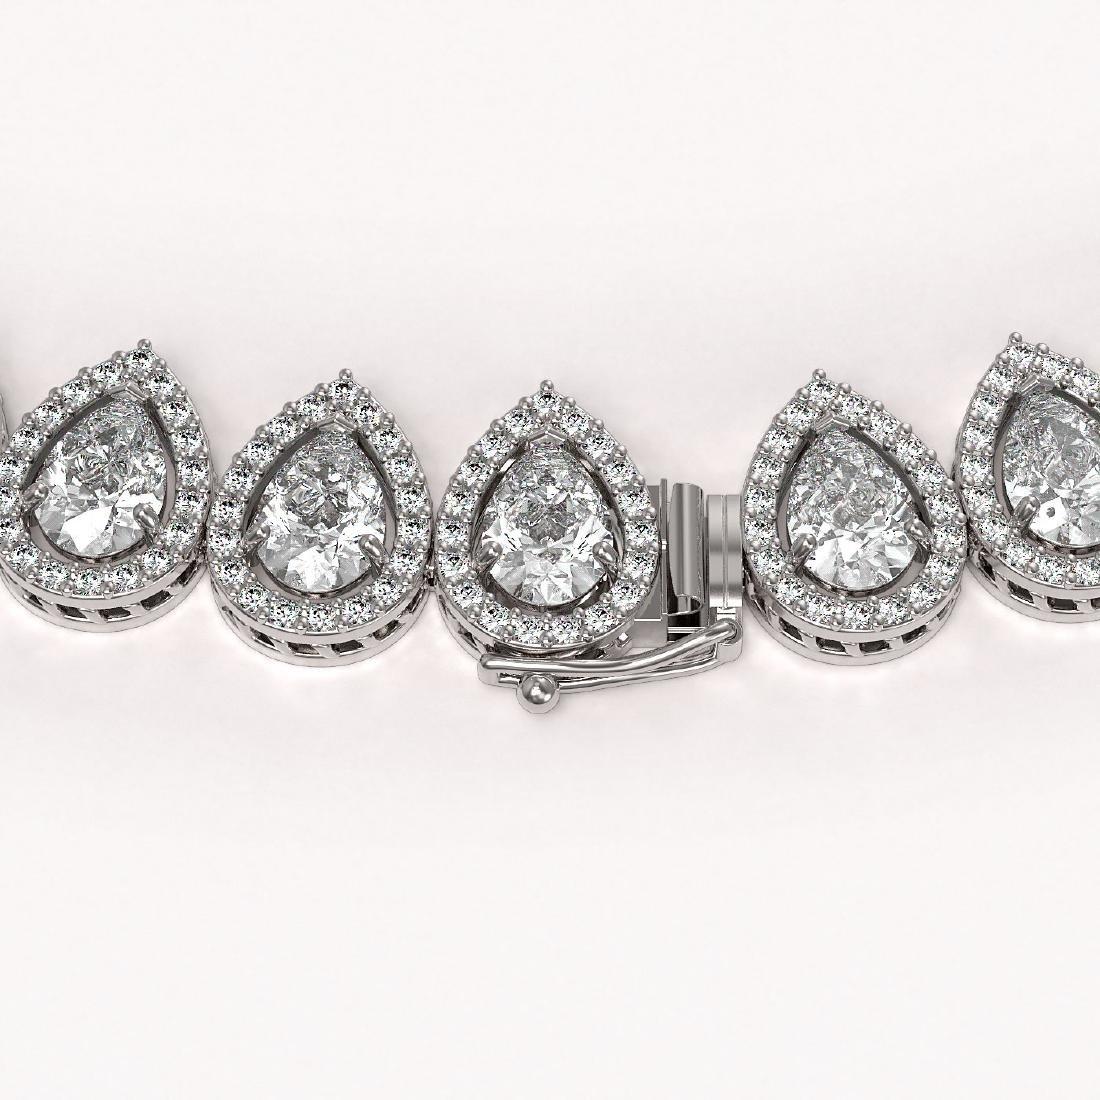 42.11 CTW Pear Diamond Designer Necklace 18K White Gold - 3